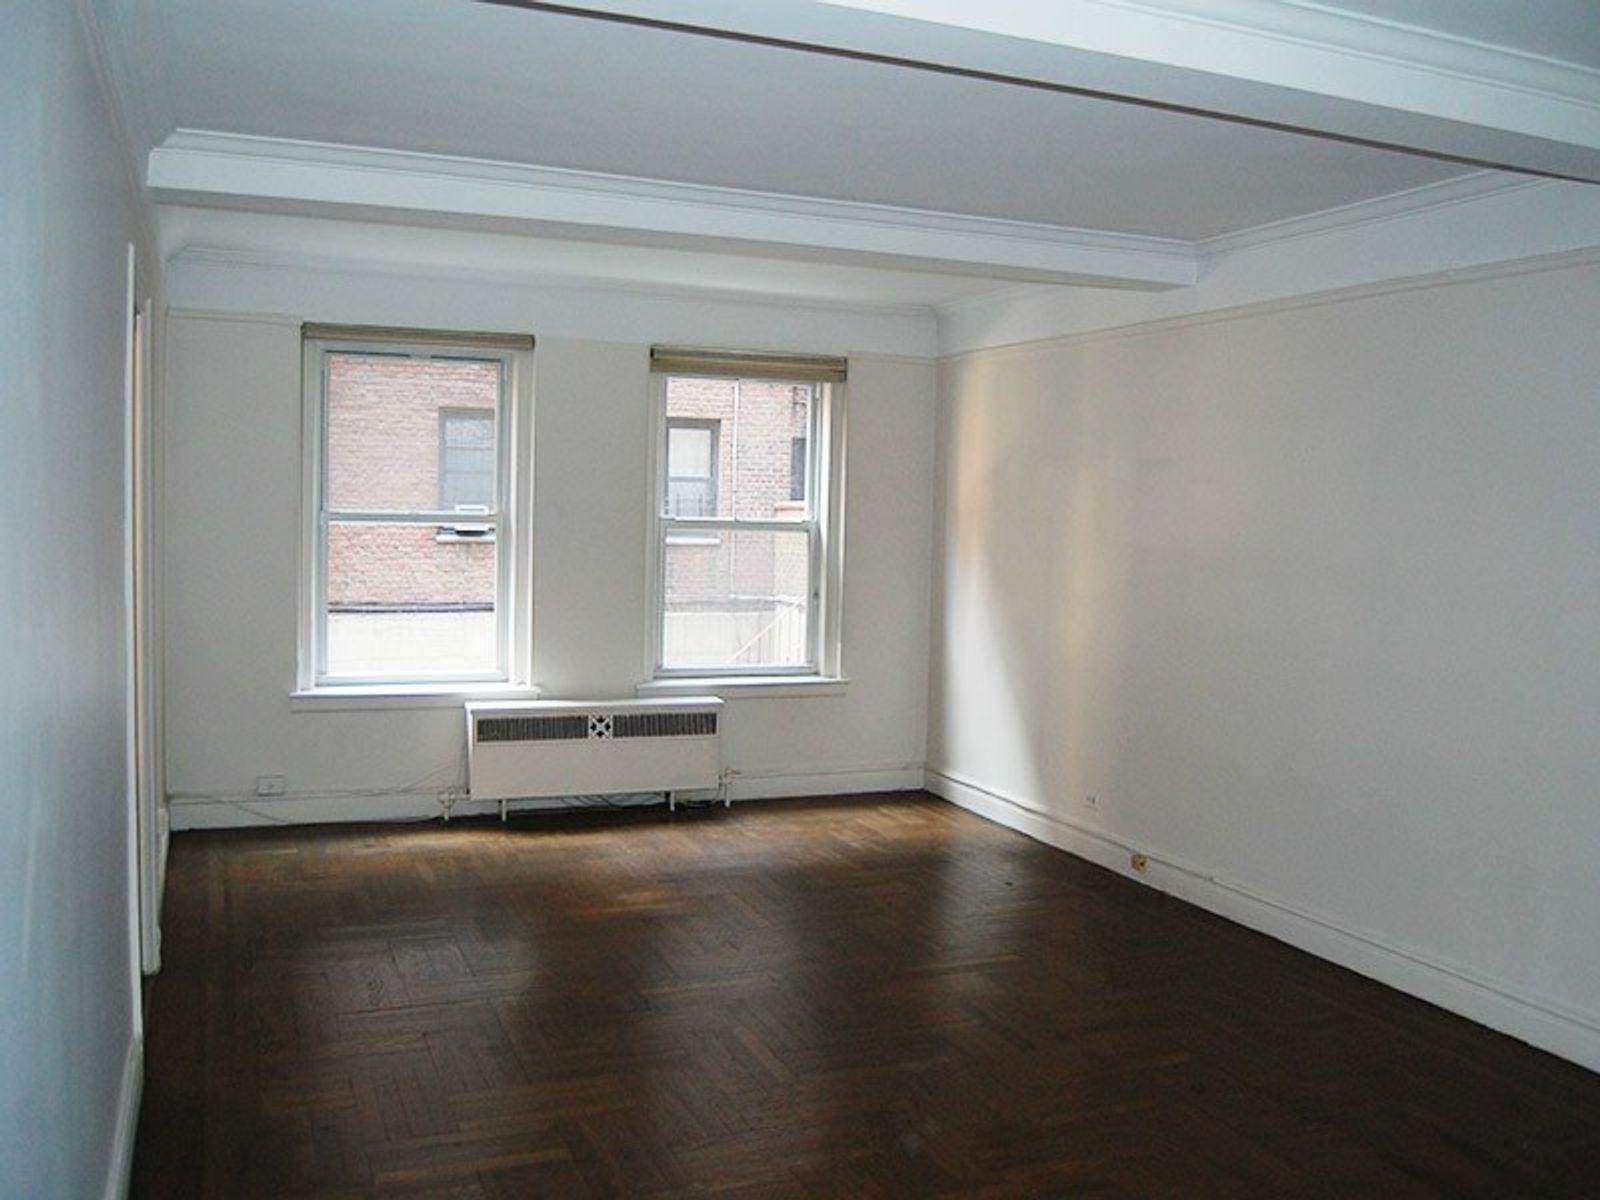 325 East 79th Street, Apt 2D